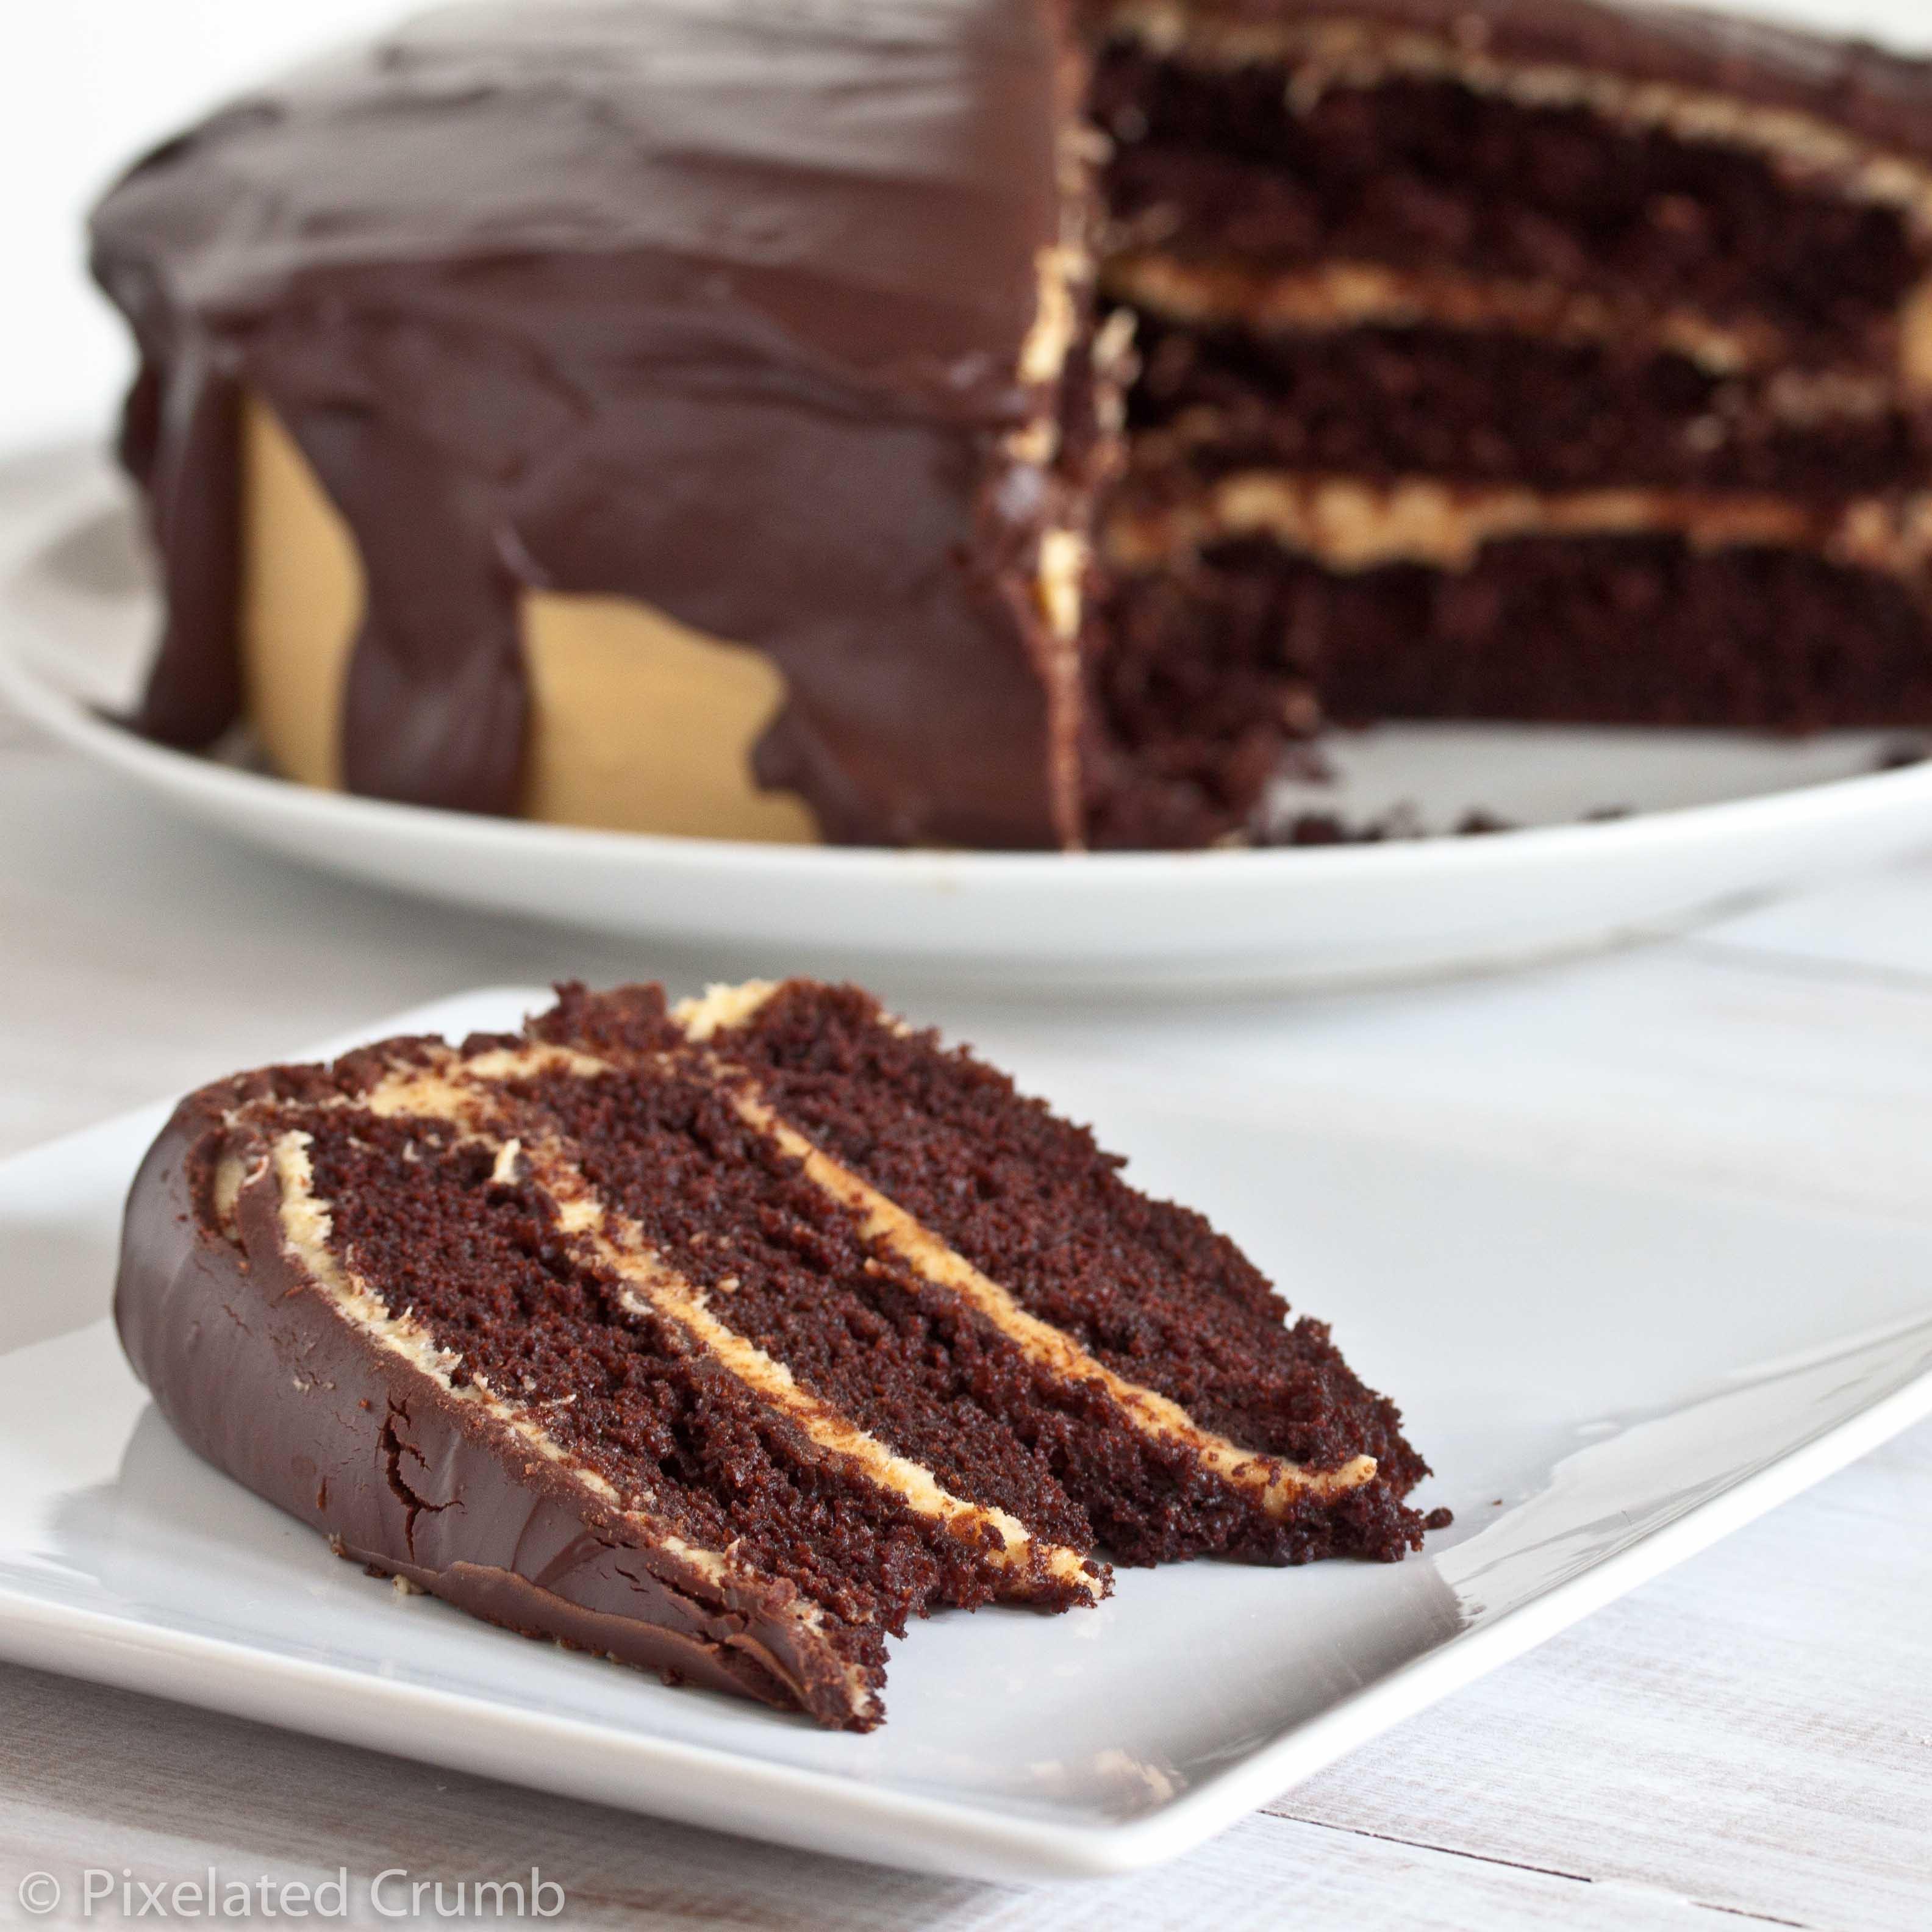 Chocolate Peanut Butter Cake Recipe  The Ultimate Chocolate Peanut Butter Cake